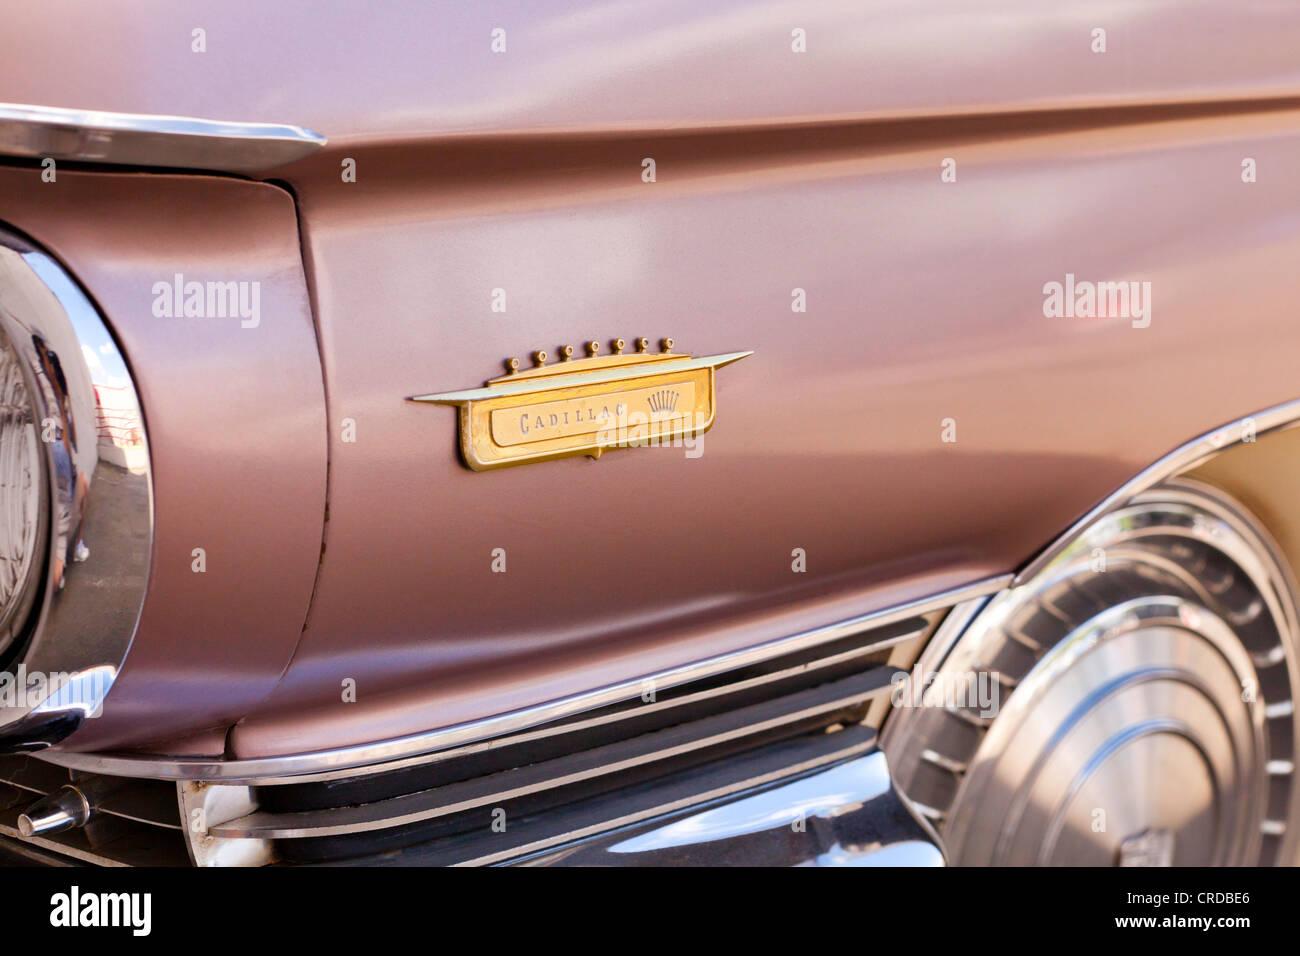 Vintage 1960 Cadillac Eldorado badge - California USA - Stock Image